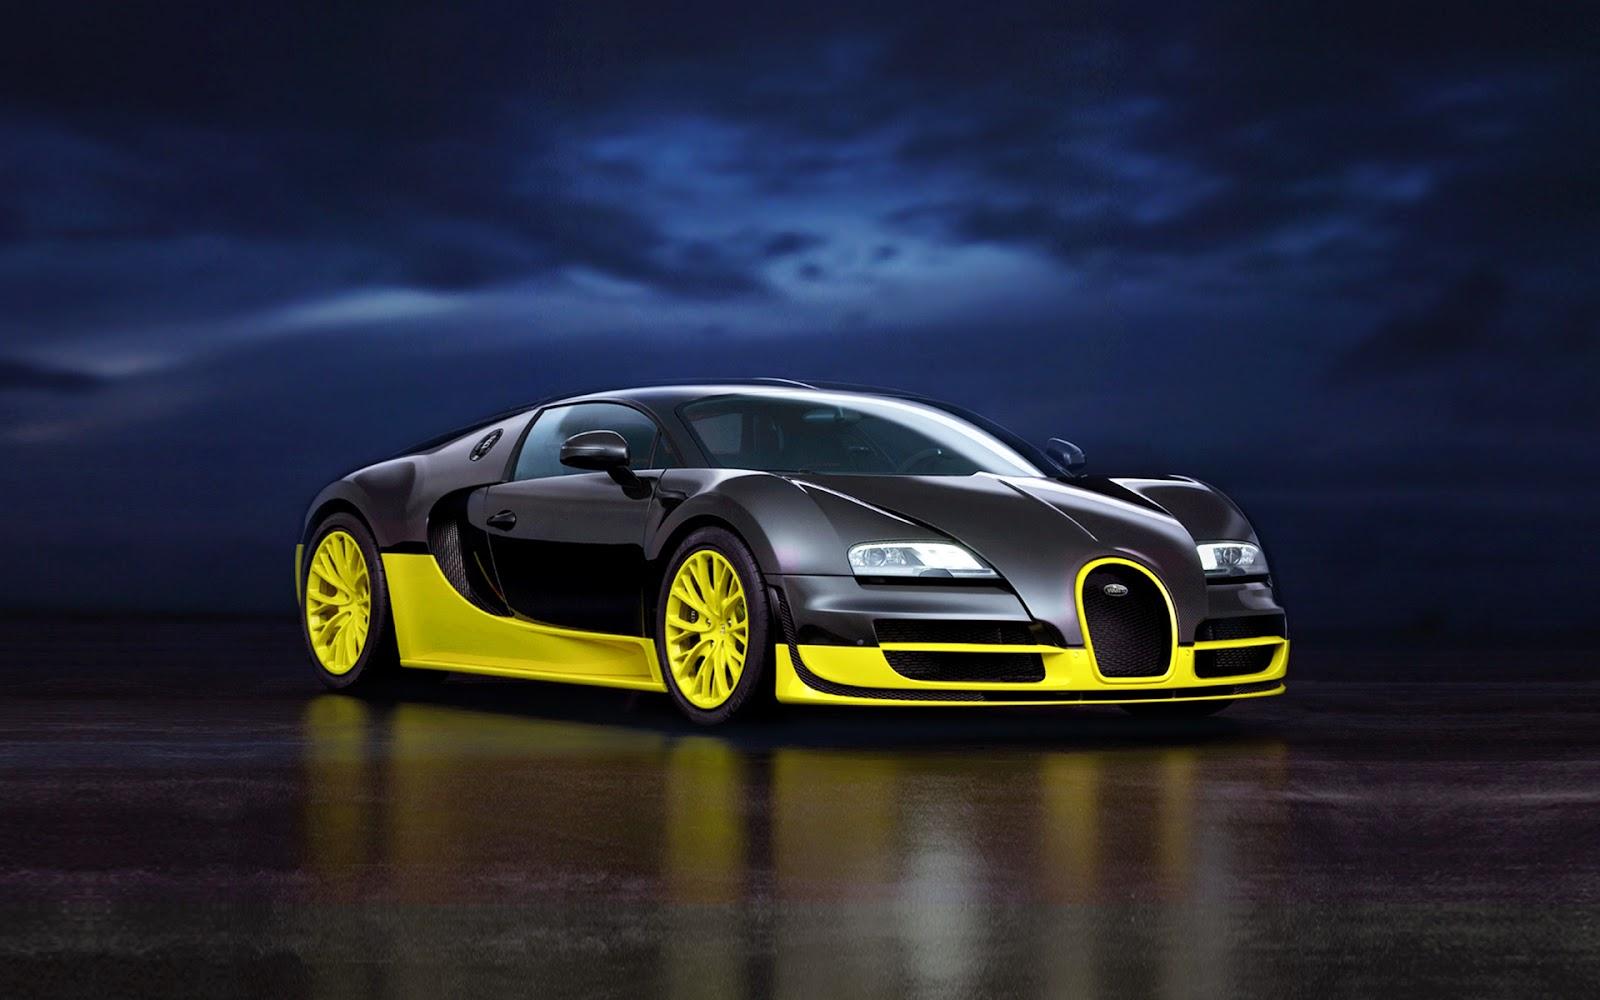 Bugatti Super Veyron HD Wallpaper